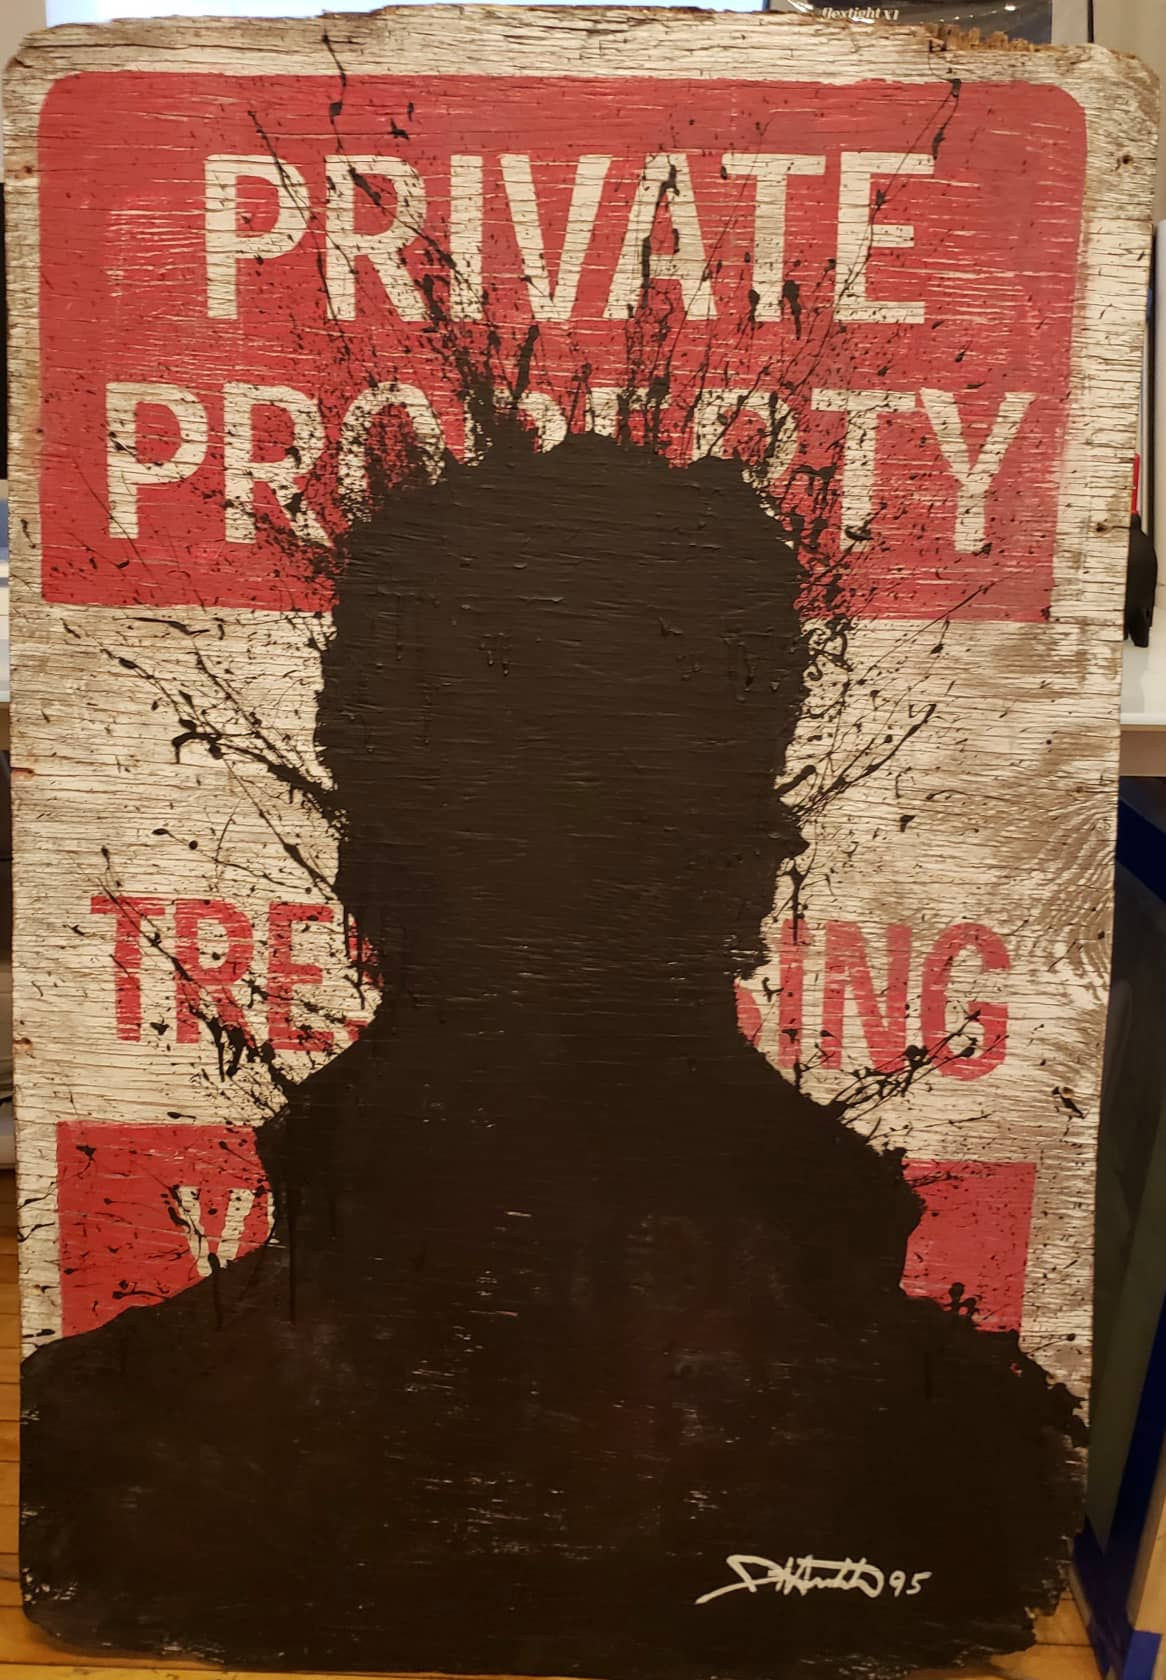 Richard Hambleton, Private Property Sign, 1995